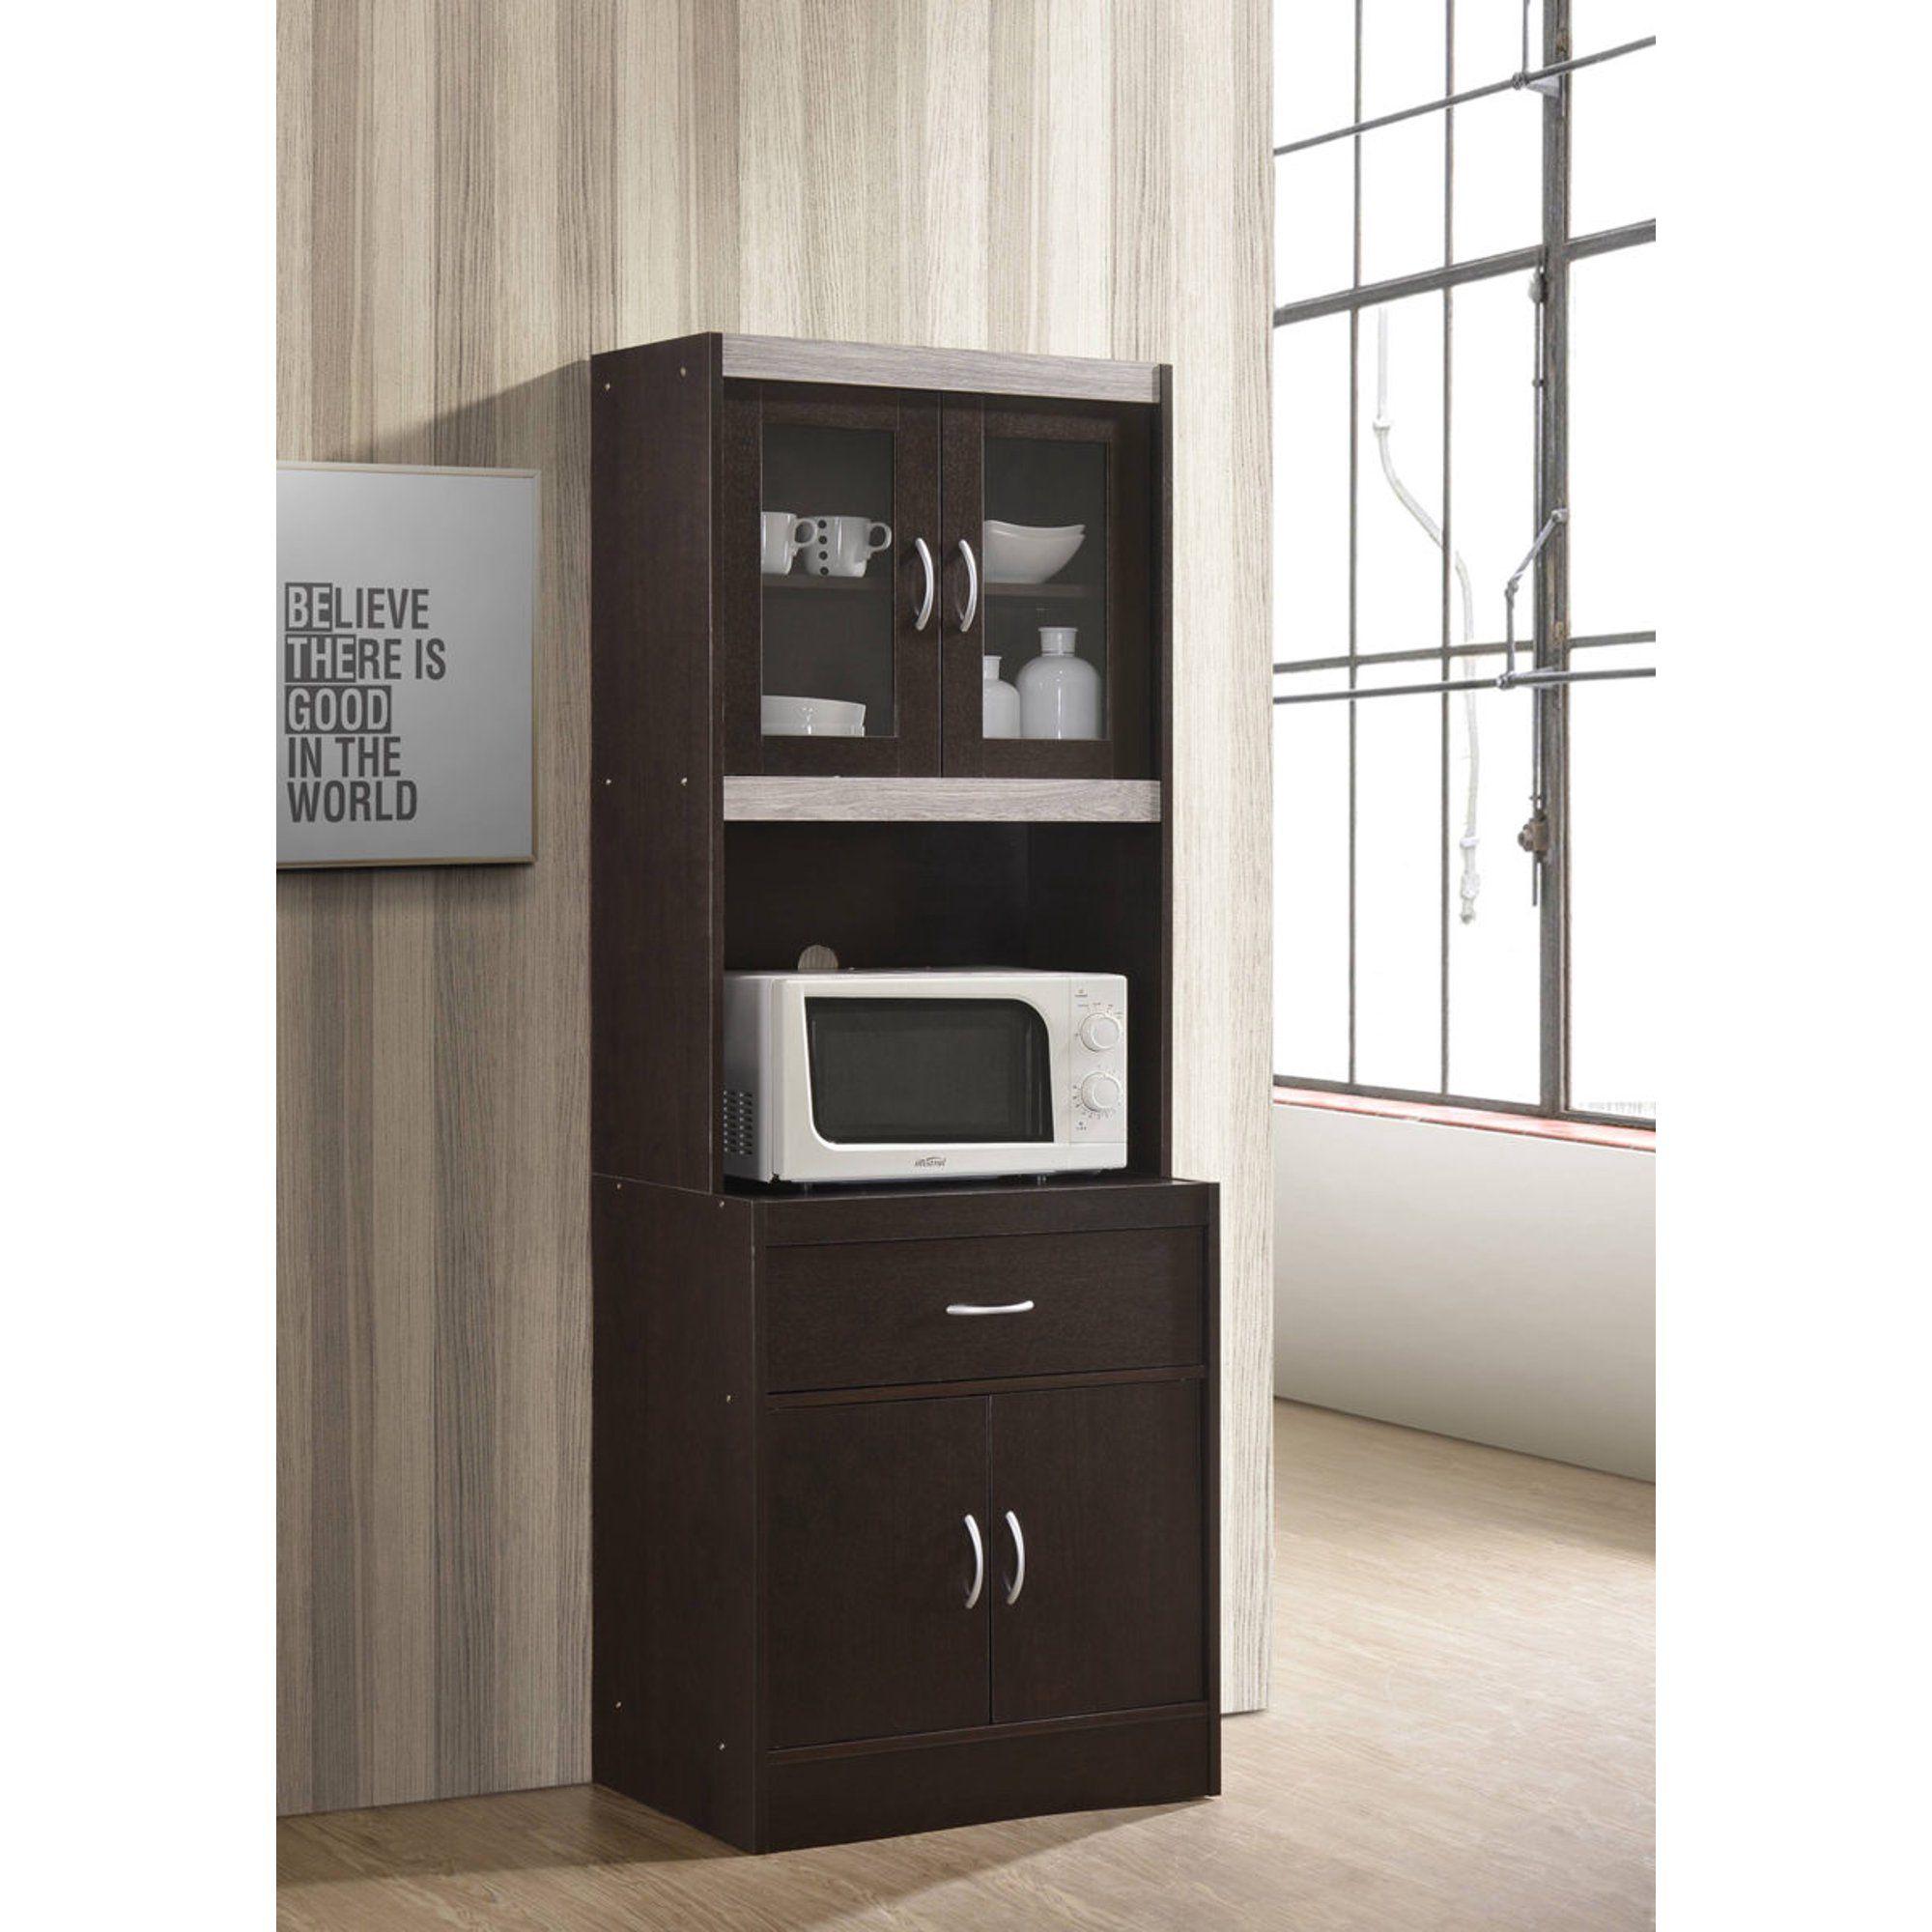 Hodedah Modern Kitchen Cabinet Cherry Walmart Com In 2020 Modern Kitchen Cabinets Kitchen Cabinets Kitchen Renovation